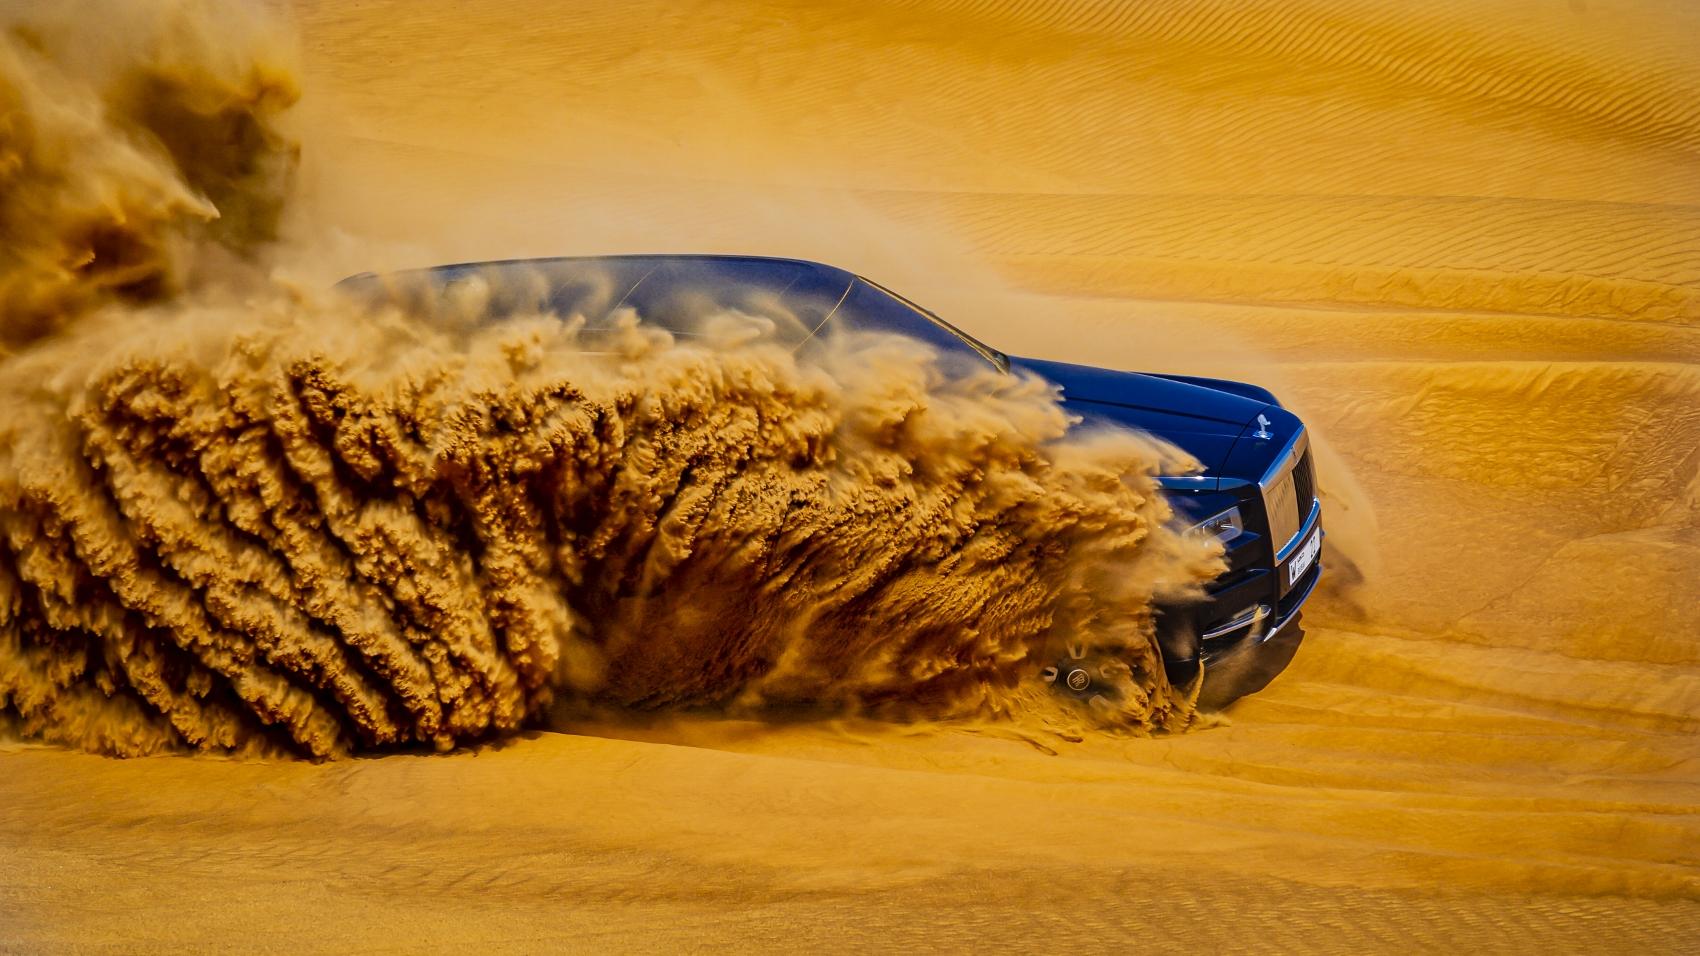 Rolls Royce Cullinan sa predviedol na púšti. Pozrite si foto aj video pTY2SLOBuK rolls-royce-cullina